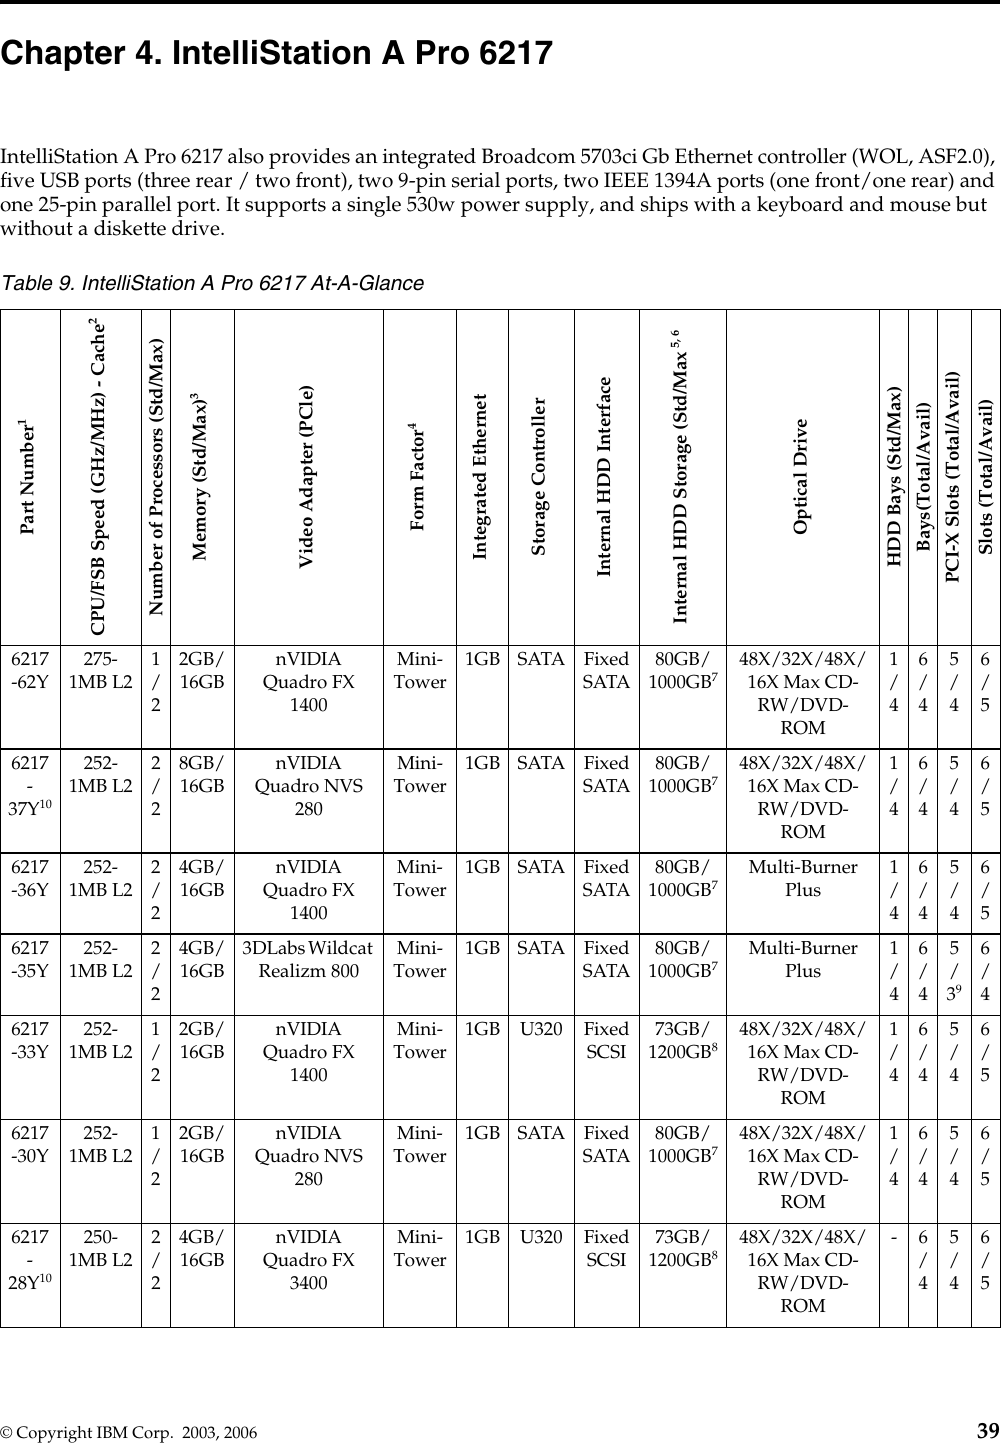 IBM 3.4GHz 2MB L2 Cache Xeon Processor PN: 40K2512